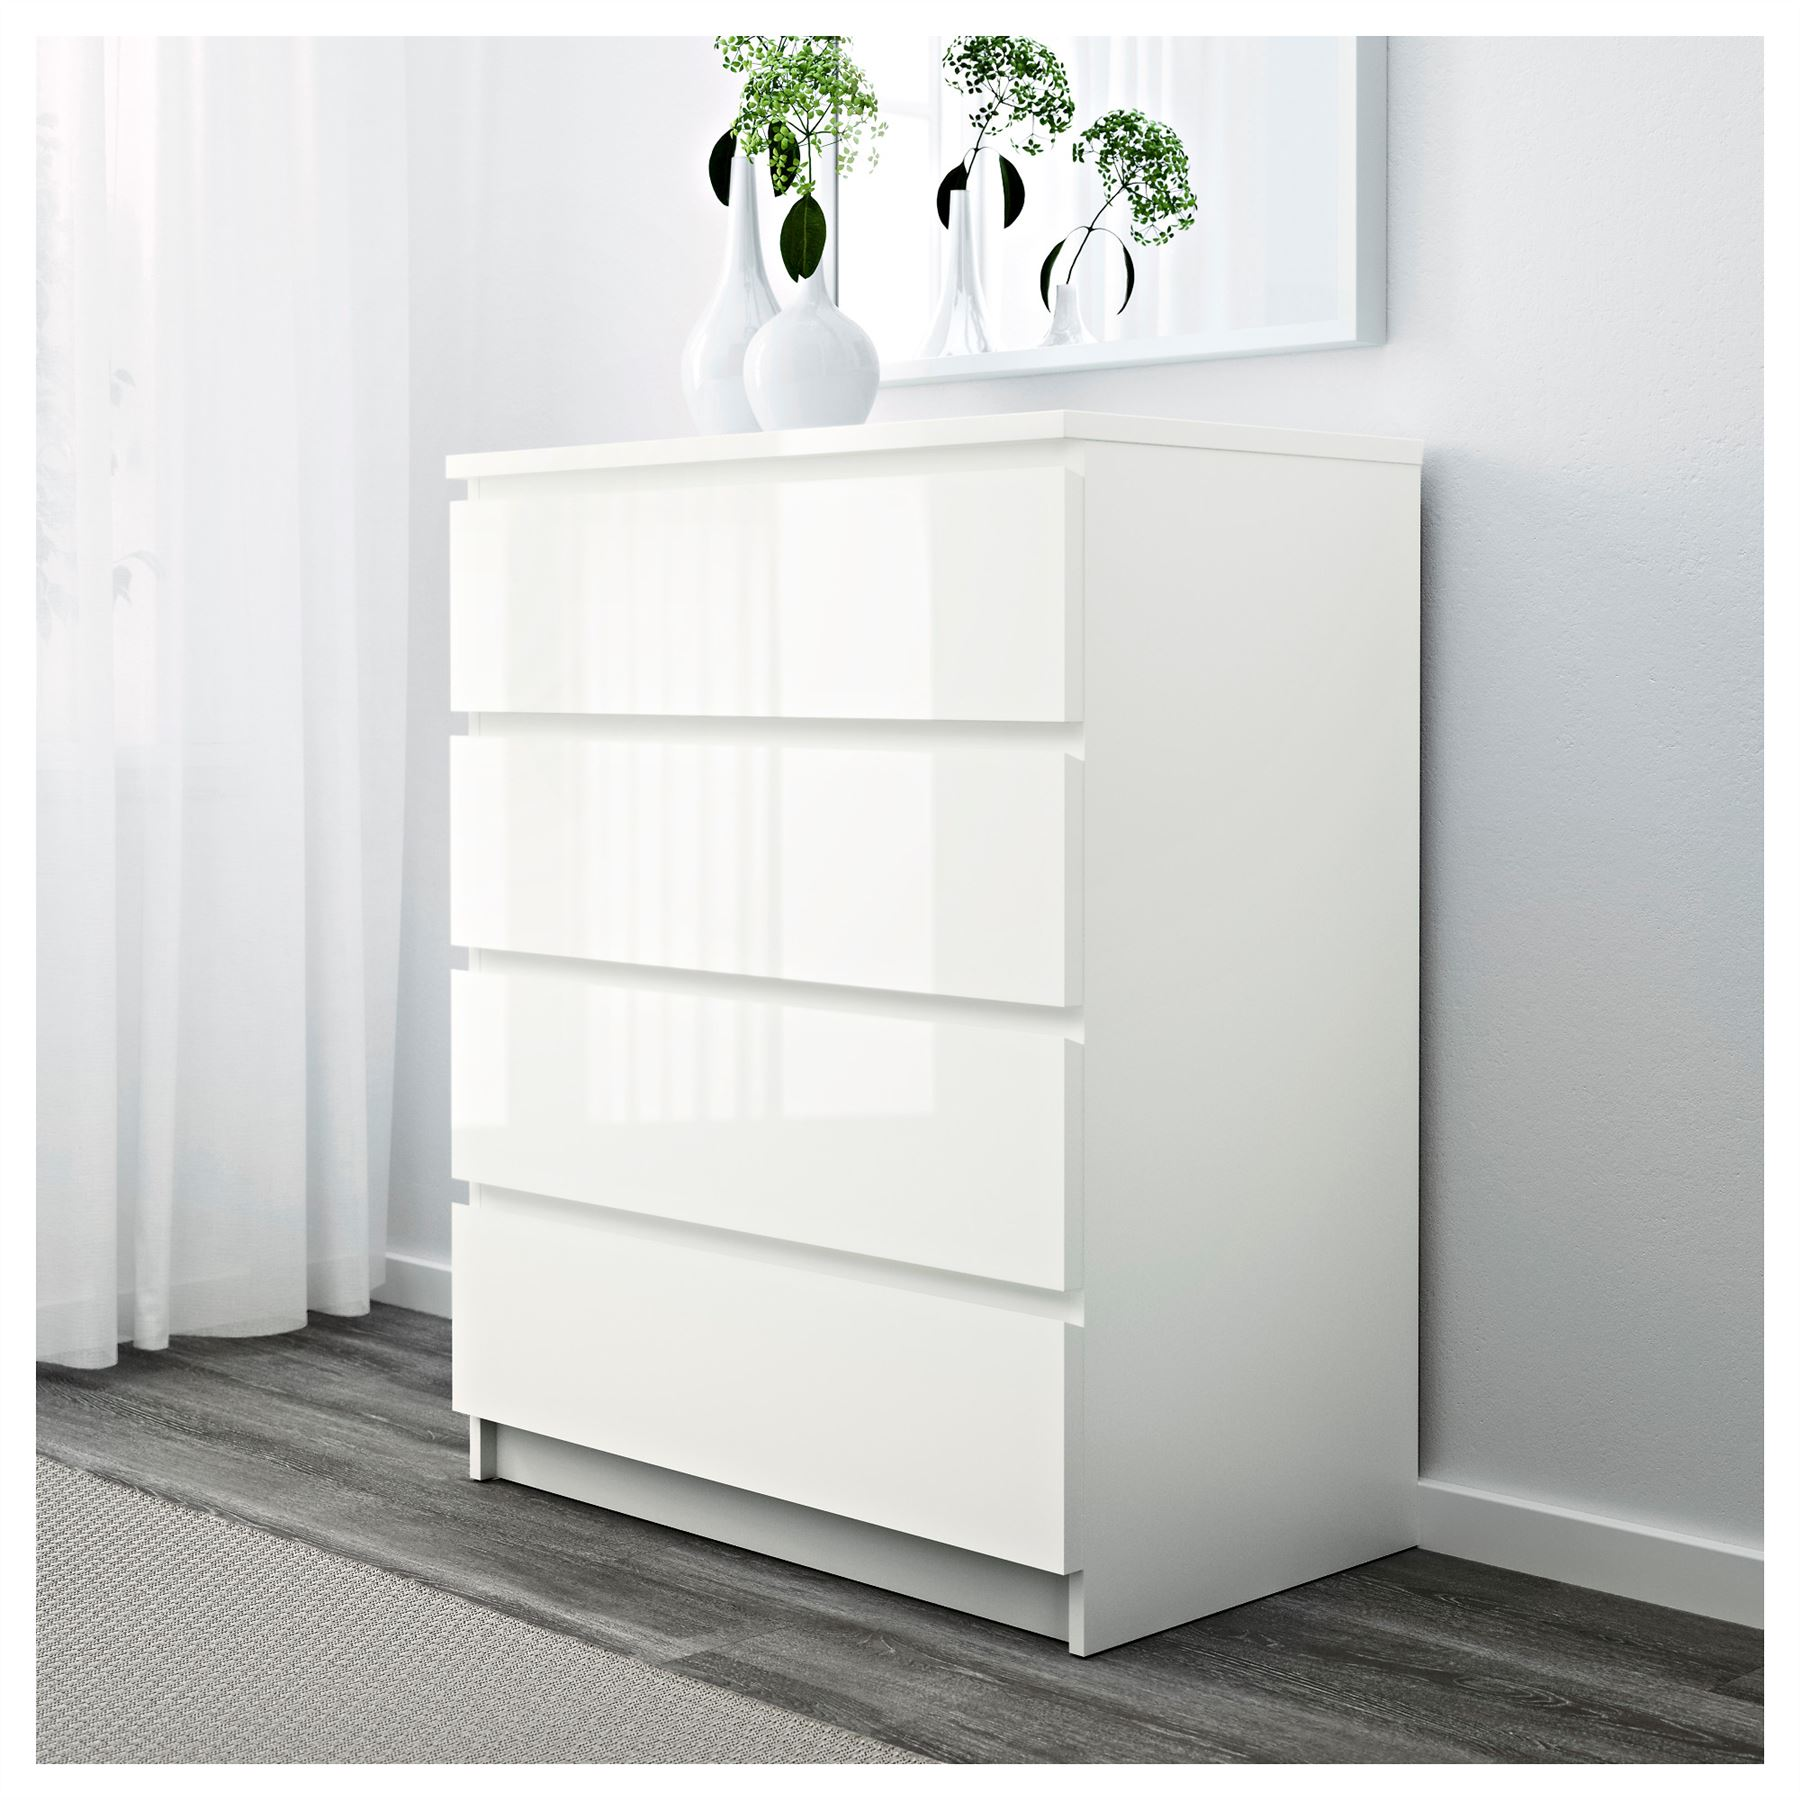 ikea high gloss bedroom furniture photo - 4